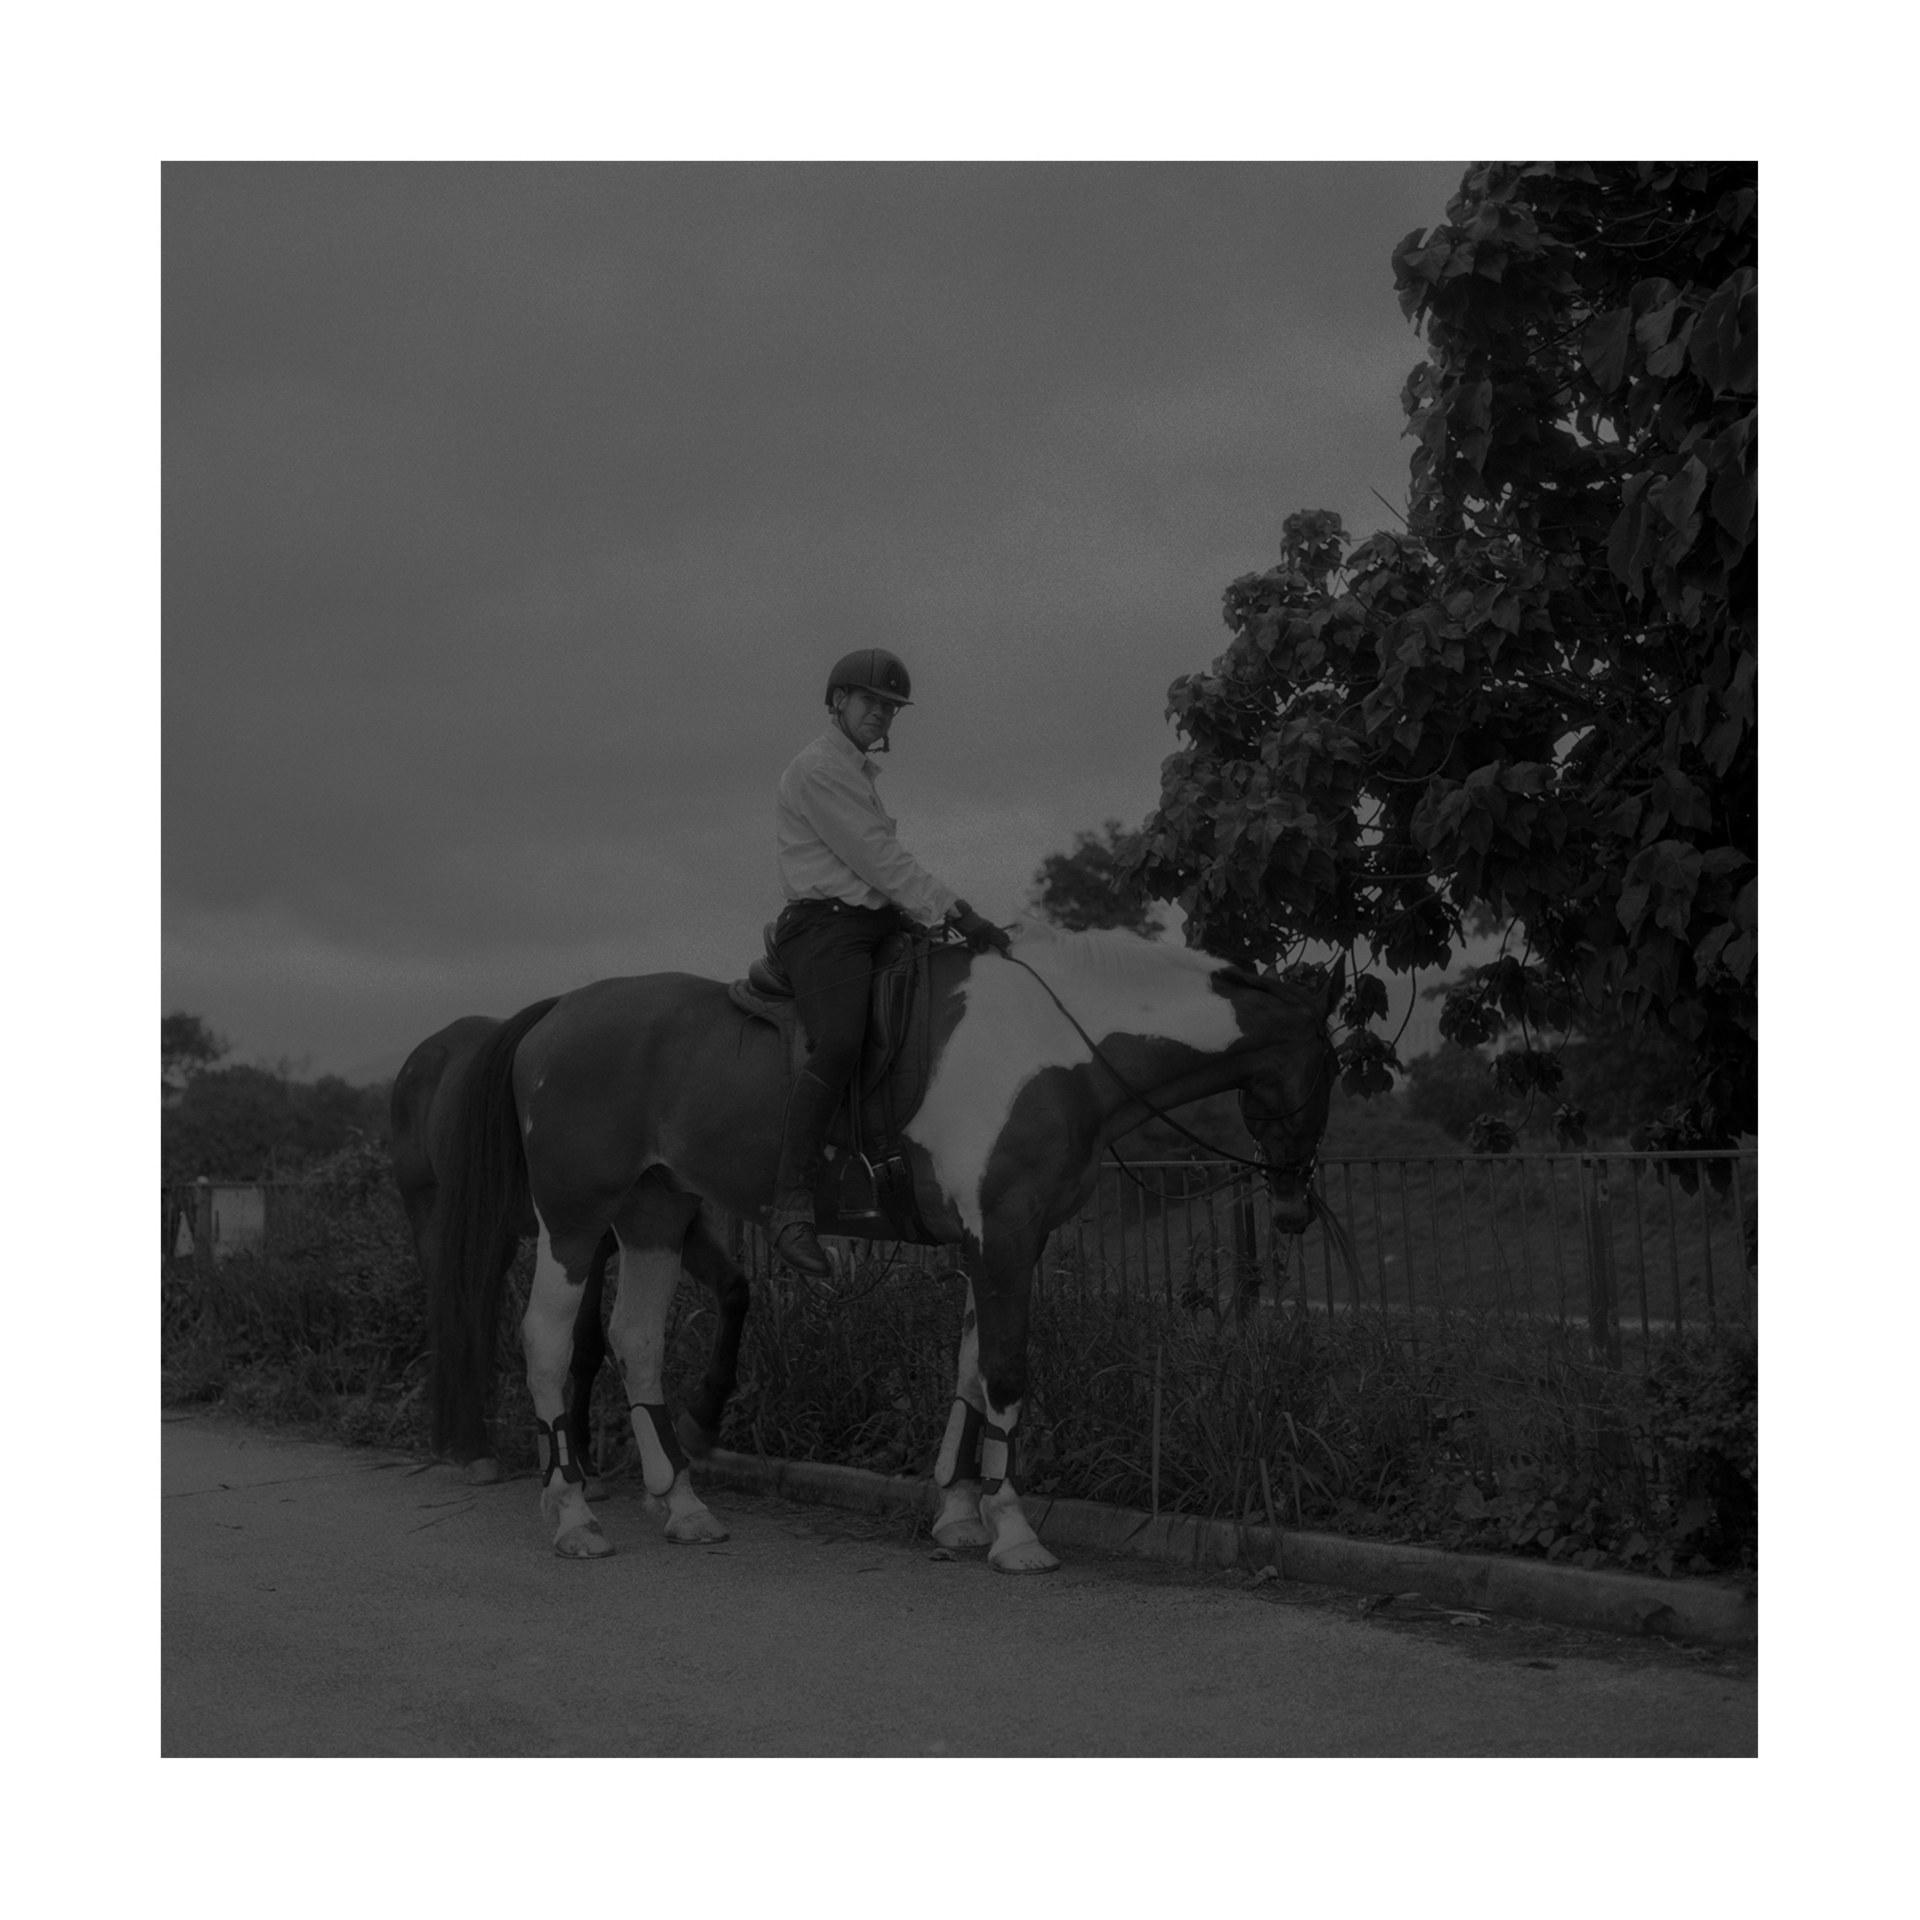 Jockey and his horse, 2020